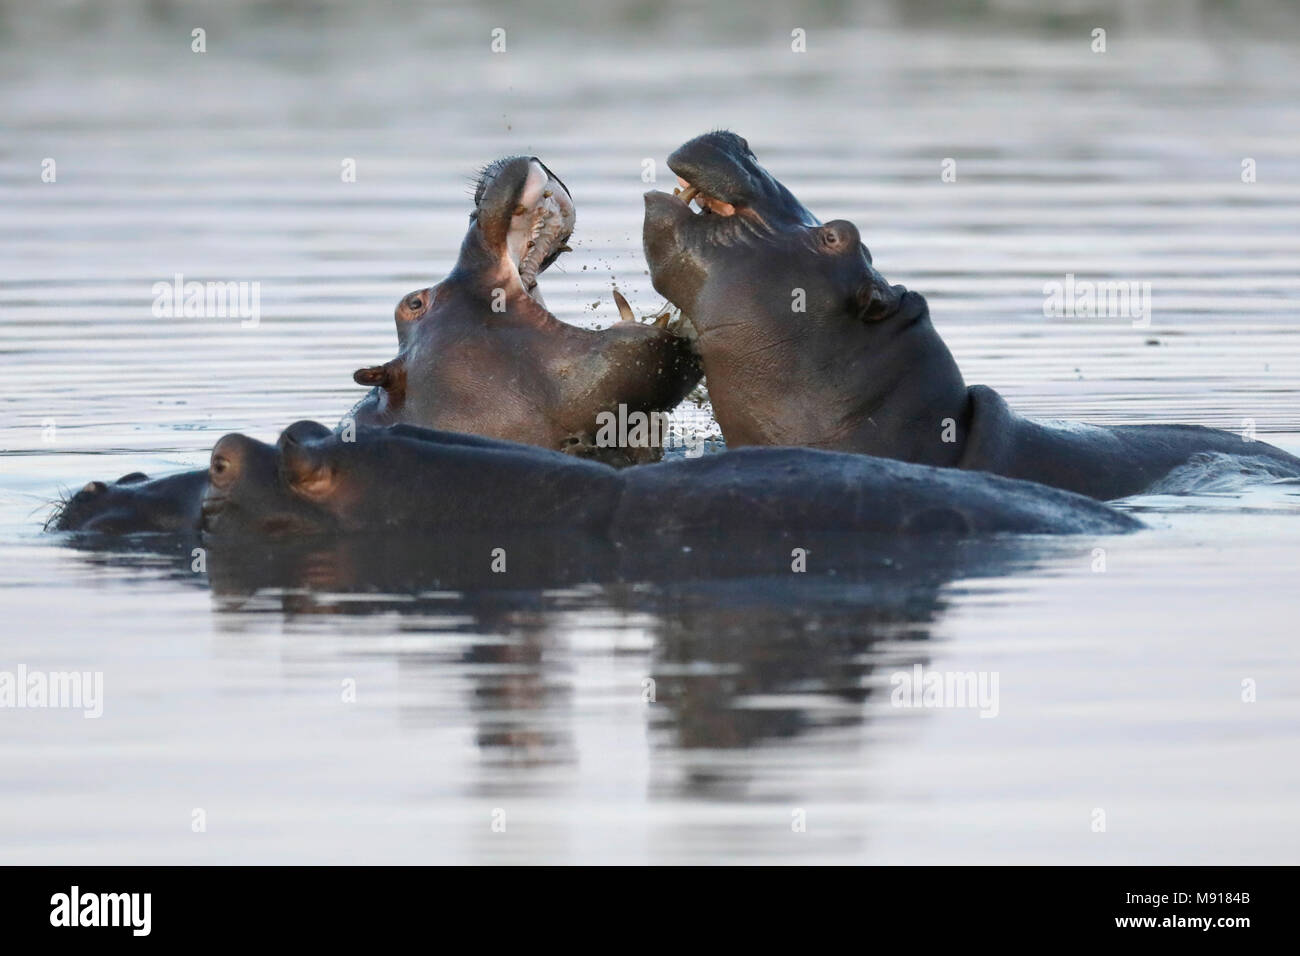 Hippopotamus at Dusk in the Moremi Game Reserv, Botswana. - Stock Image